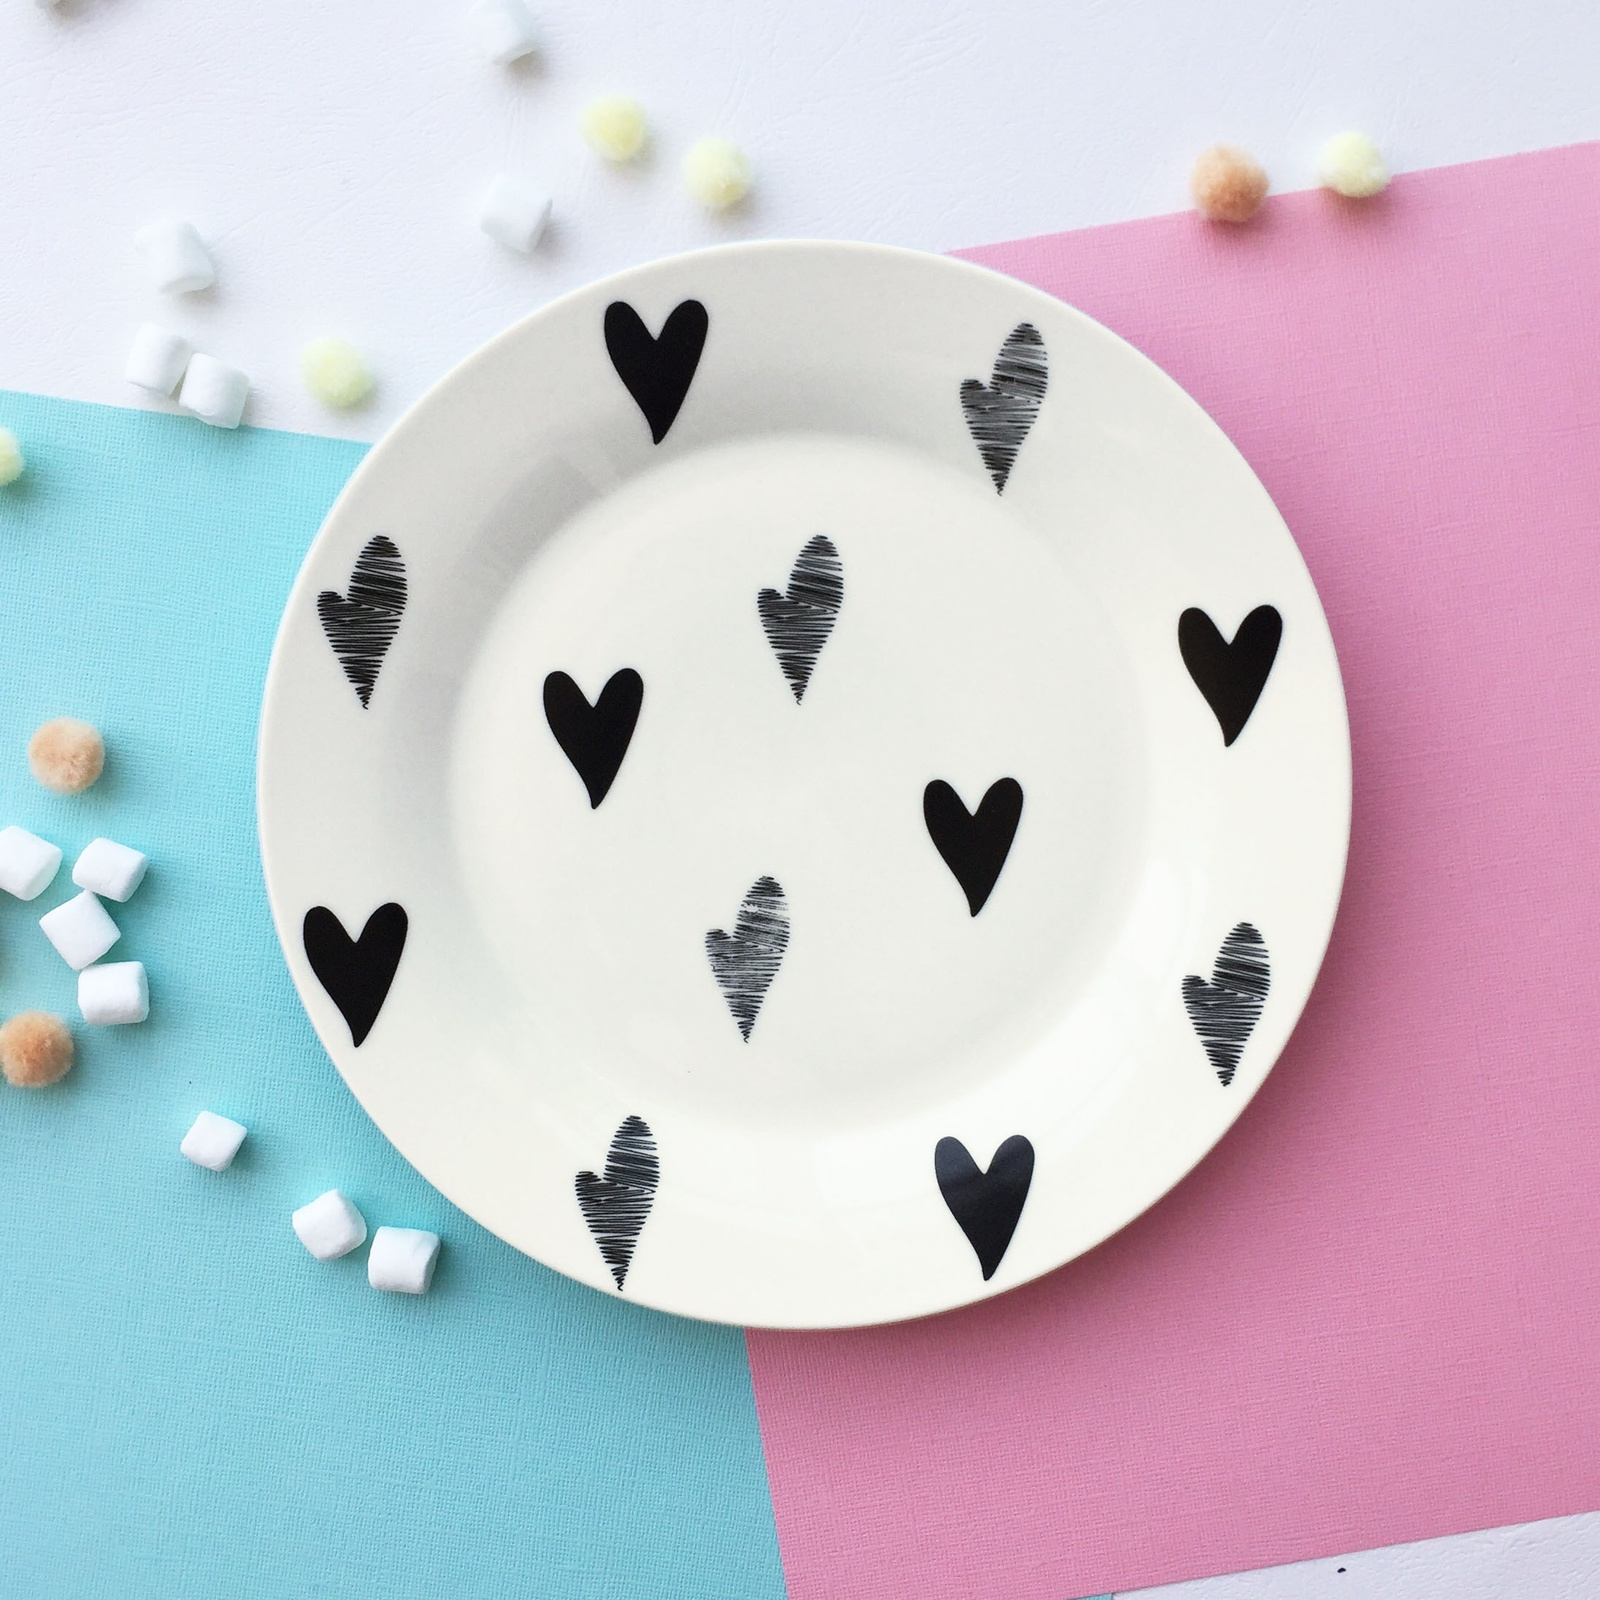 Тарелка Сотвори Чудо Маленькое сердце Vol.2 20 см, белый тарелка мелкая сотвори чудо бантик sans brides диаметр 20 см